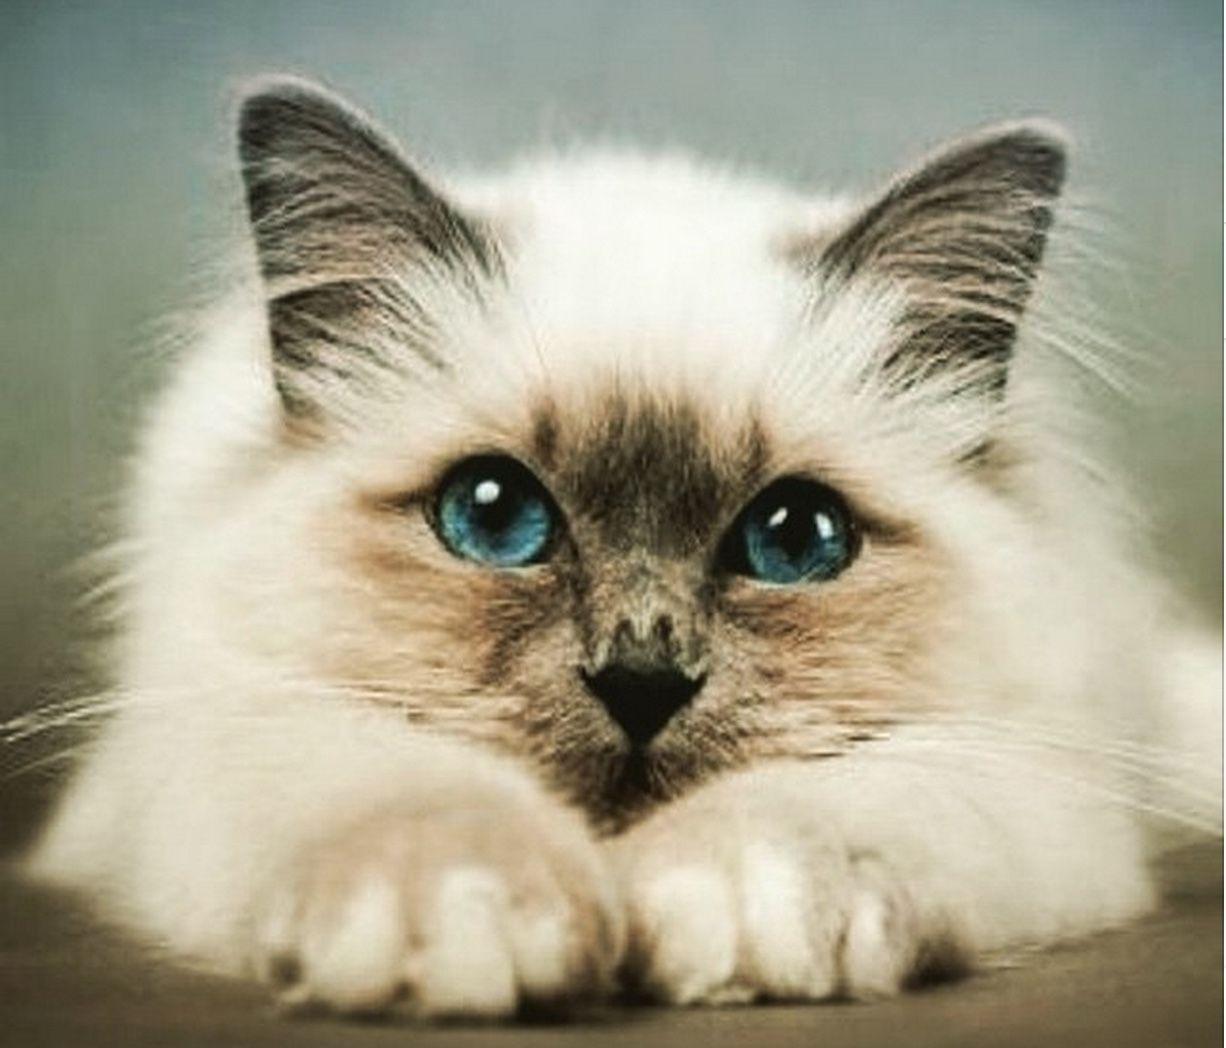 Blueeyed Beauty 28th May 2015 Cat diarrhea, Birman